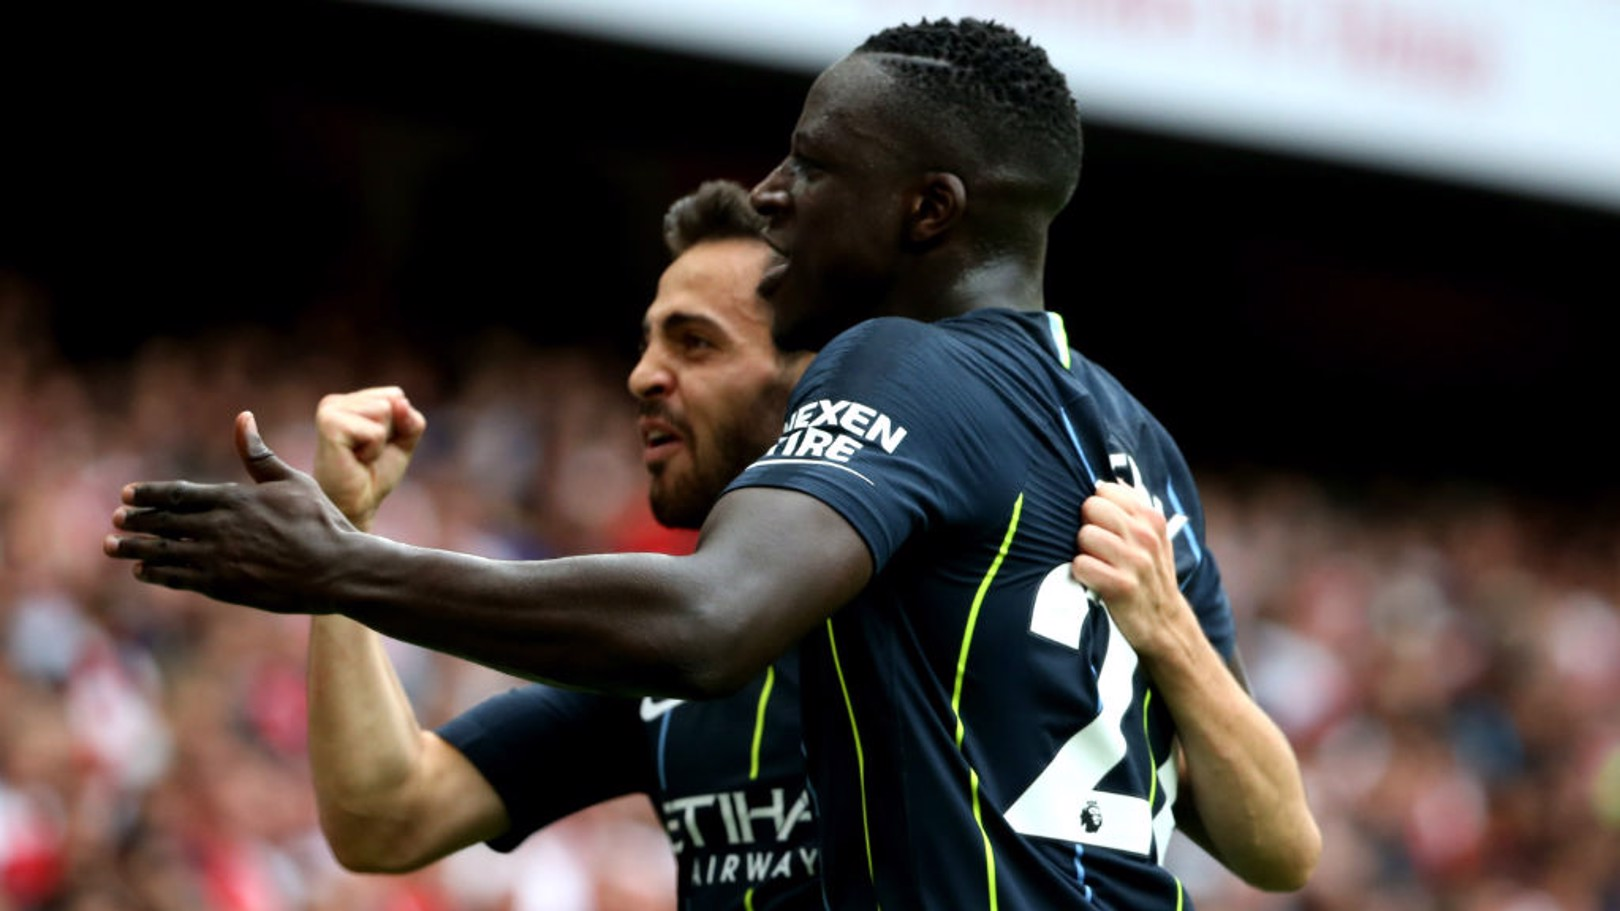 DUO: Mendy dengan assist-nya, Bernardo dengan golnya!